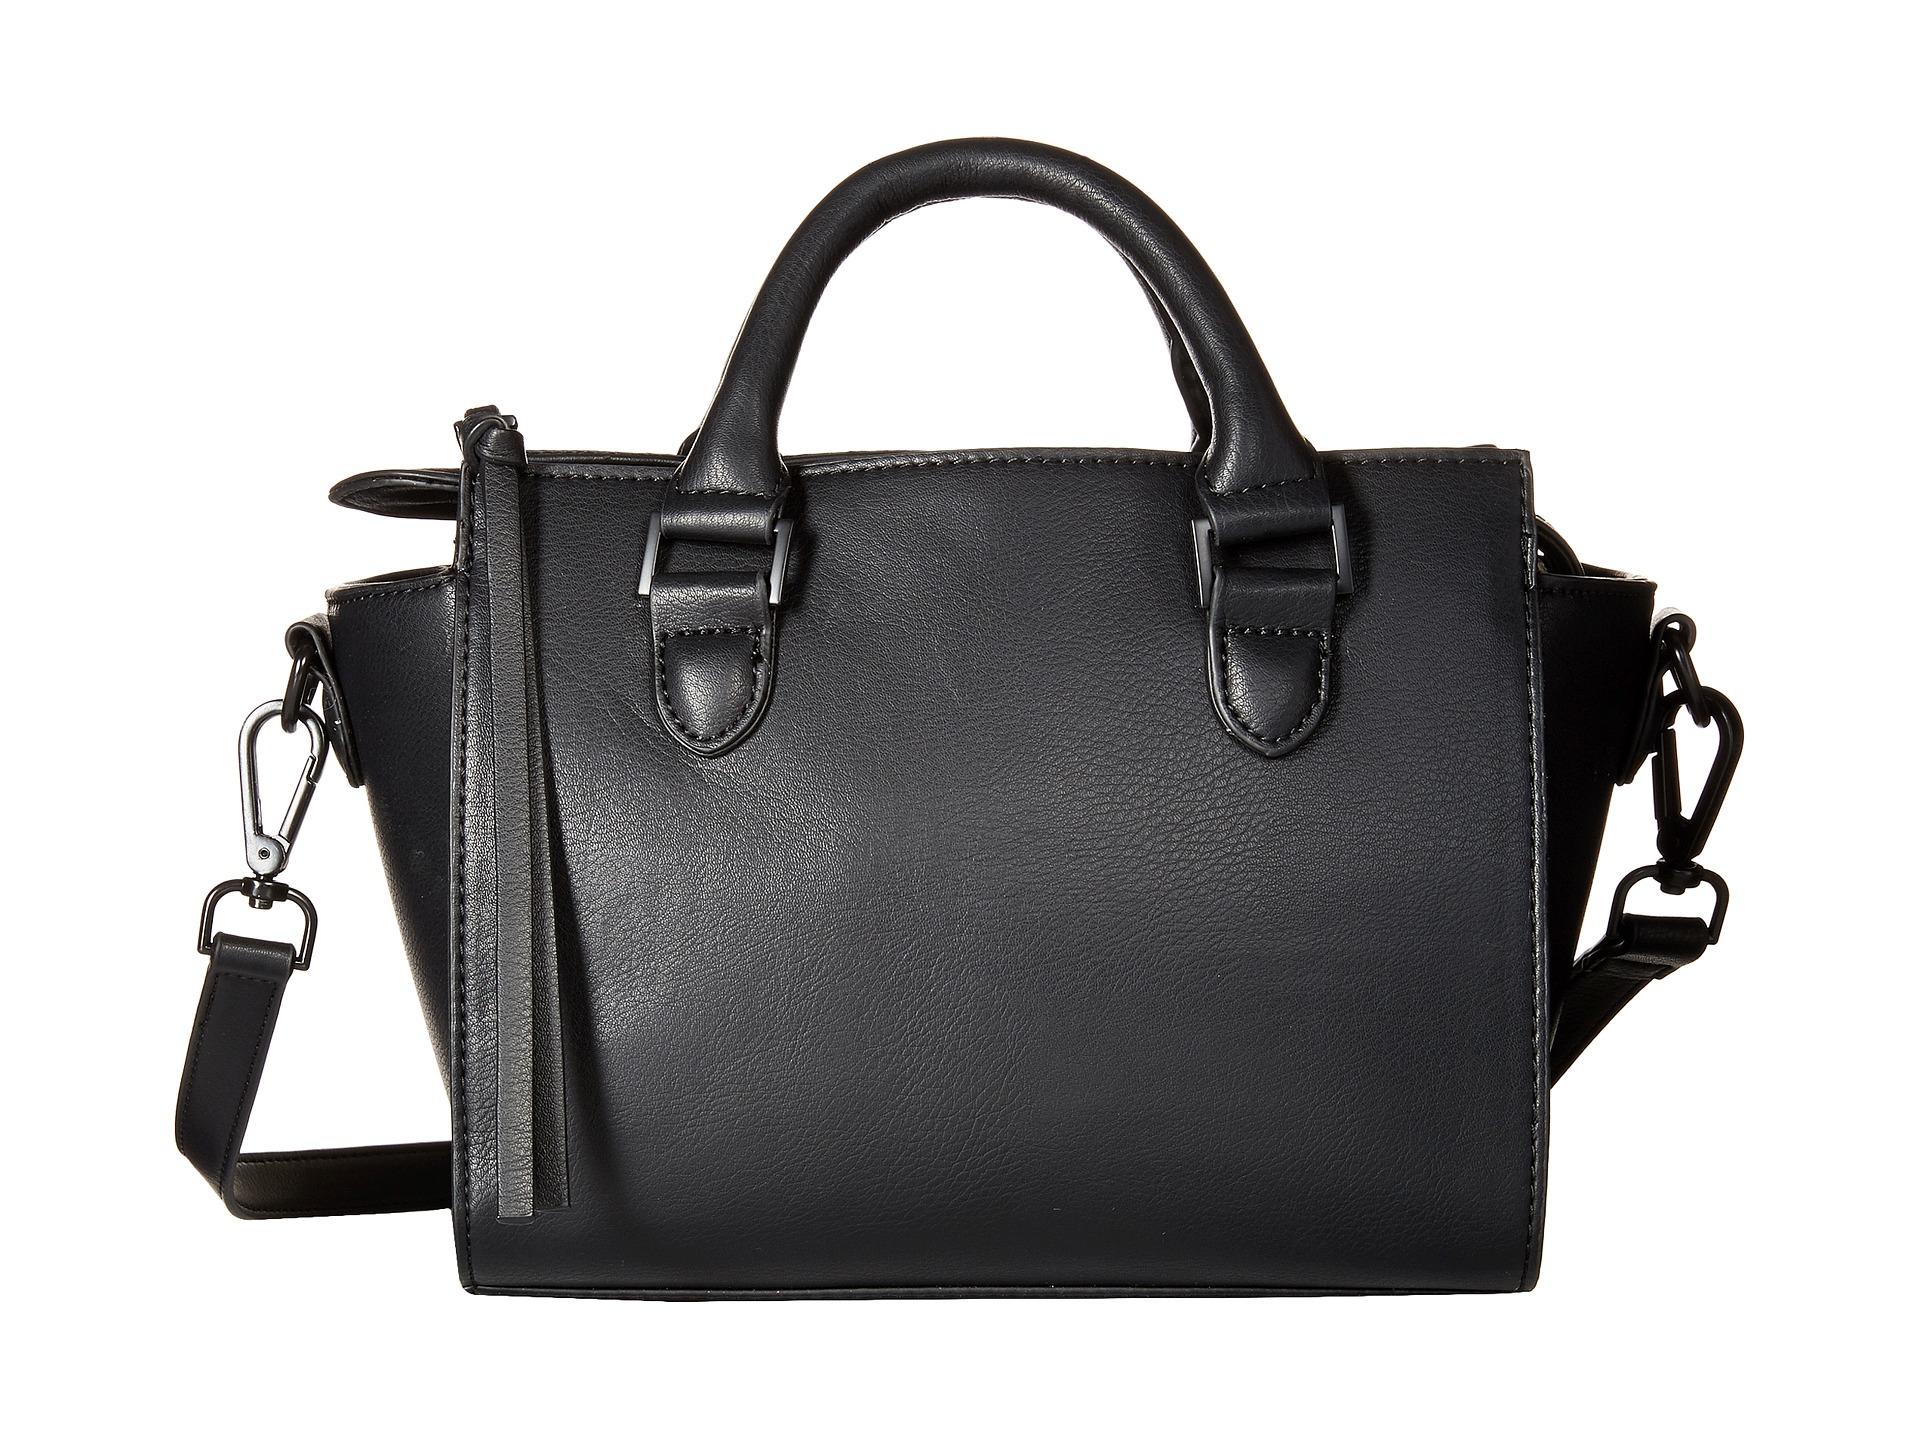 7ed5264541 Steve Madden Bwilla Mini Bag in Black - Lyst